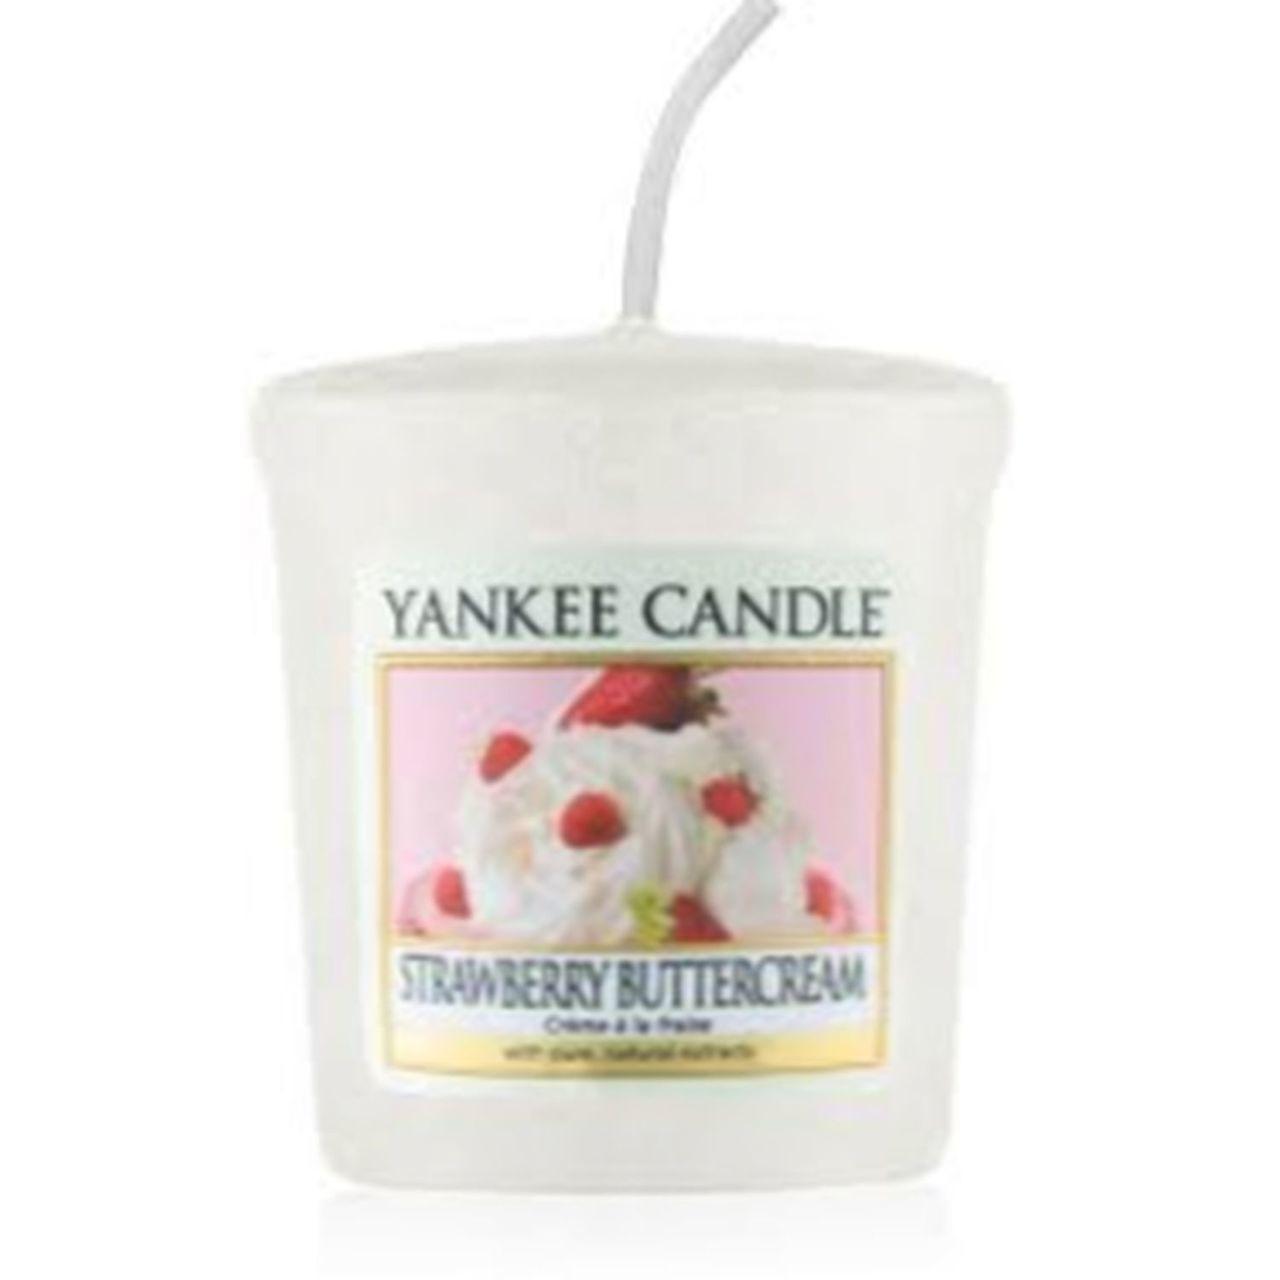 Yankee Candle - Strawberry Buttercream - Sampler